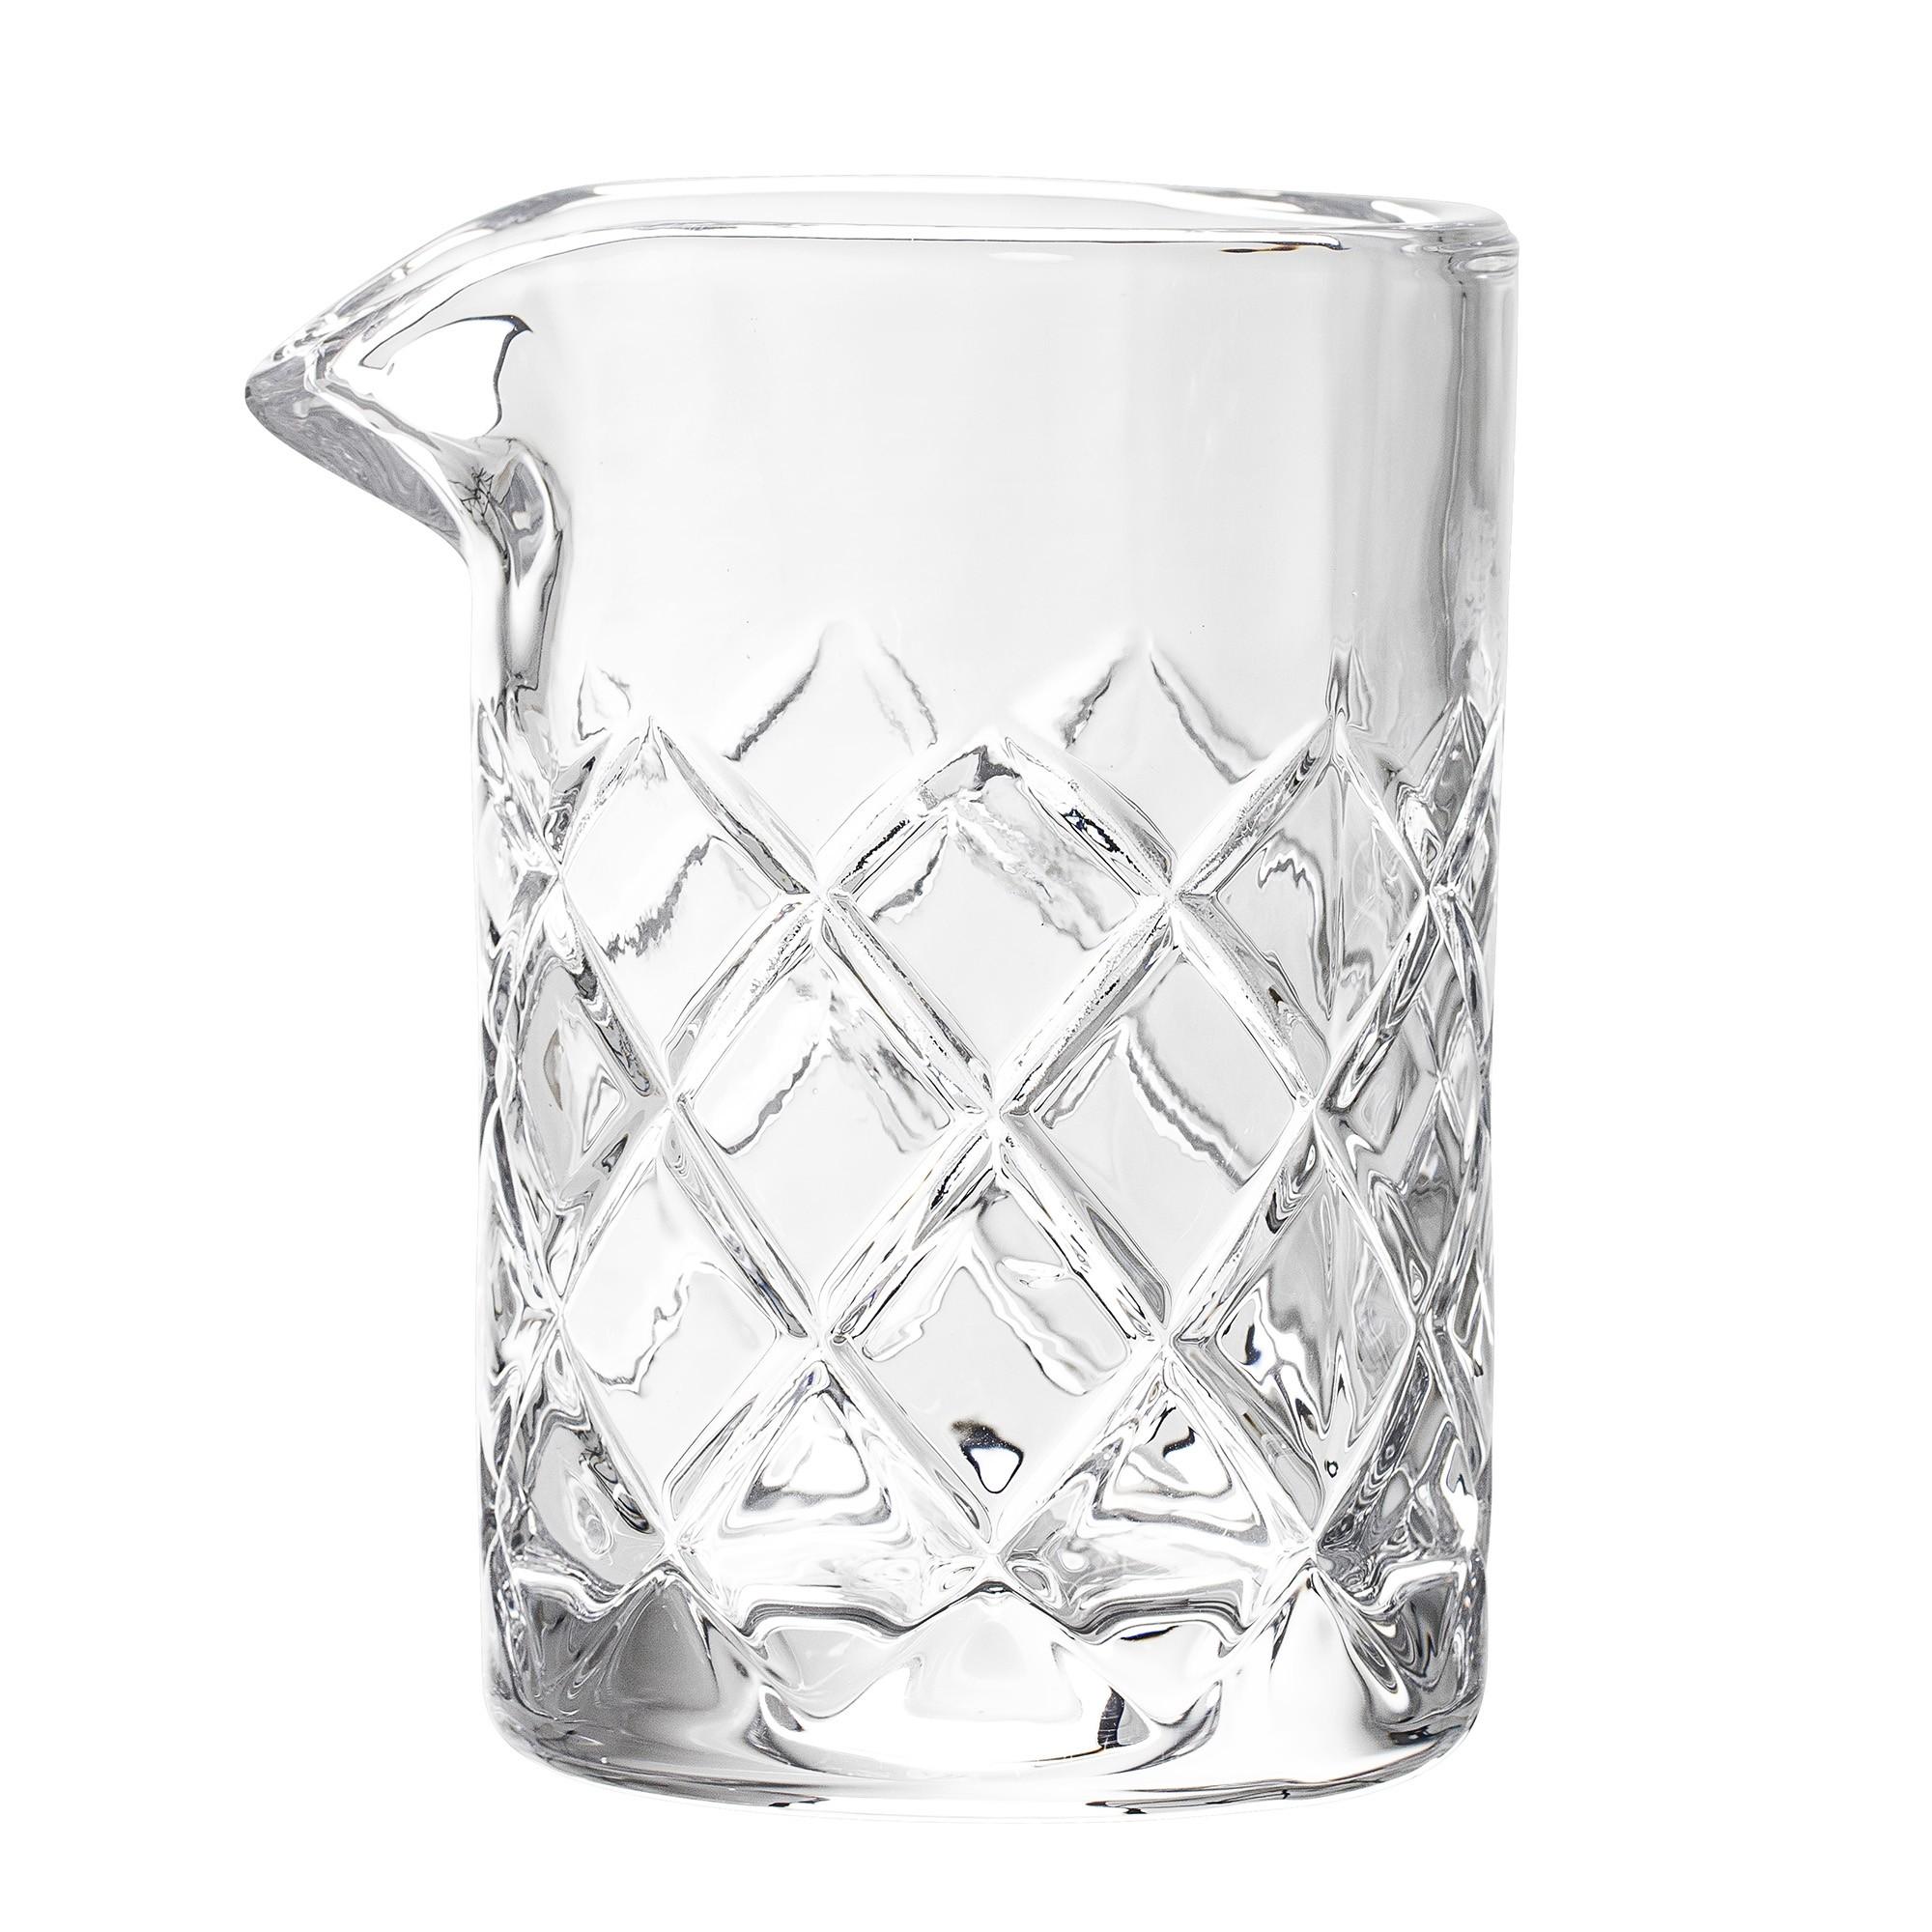 Bloomingville Glass Sif Milk Jug